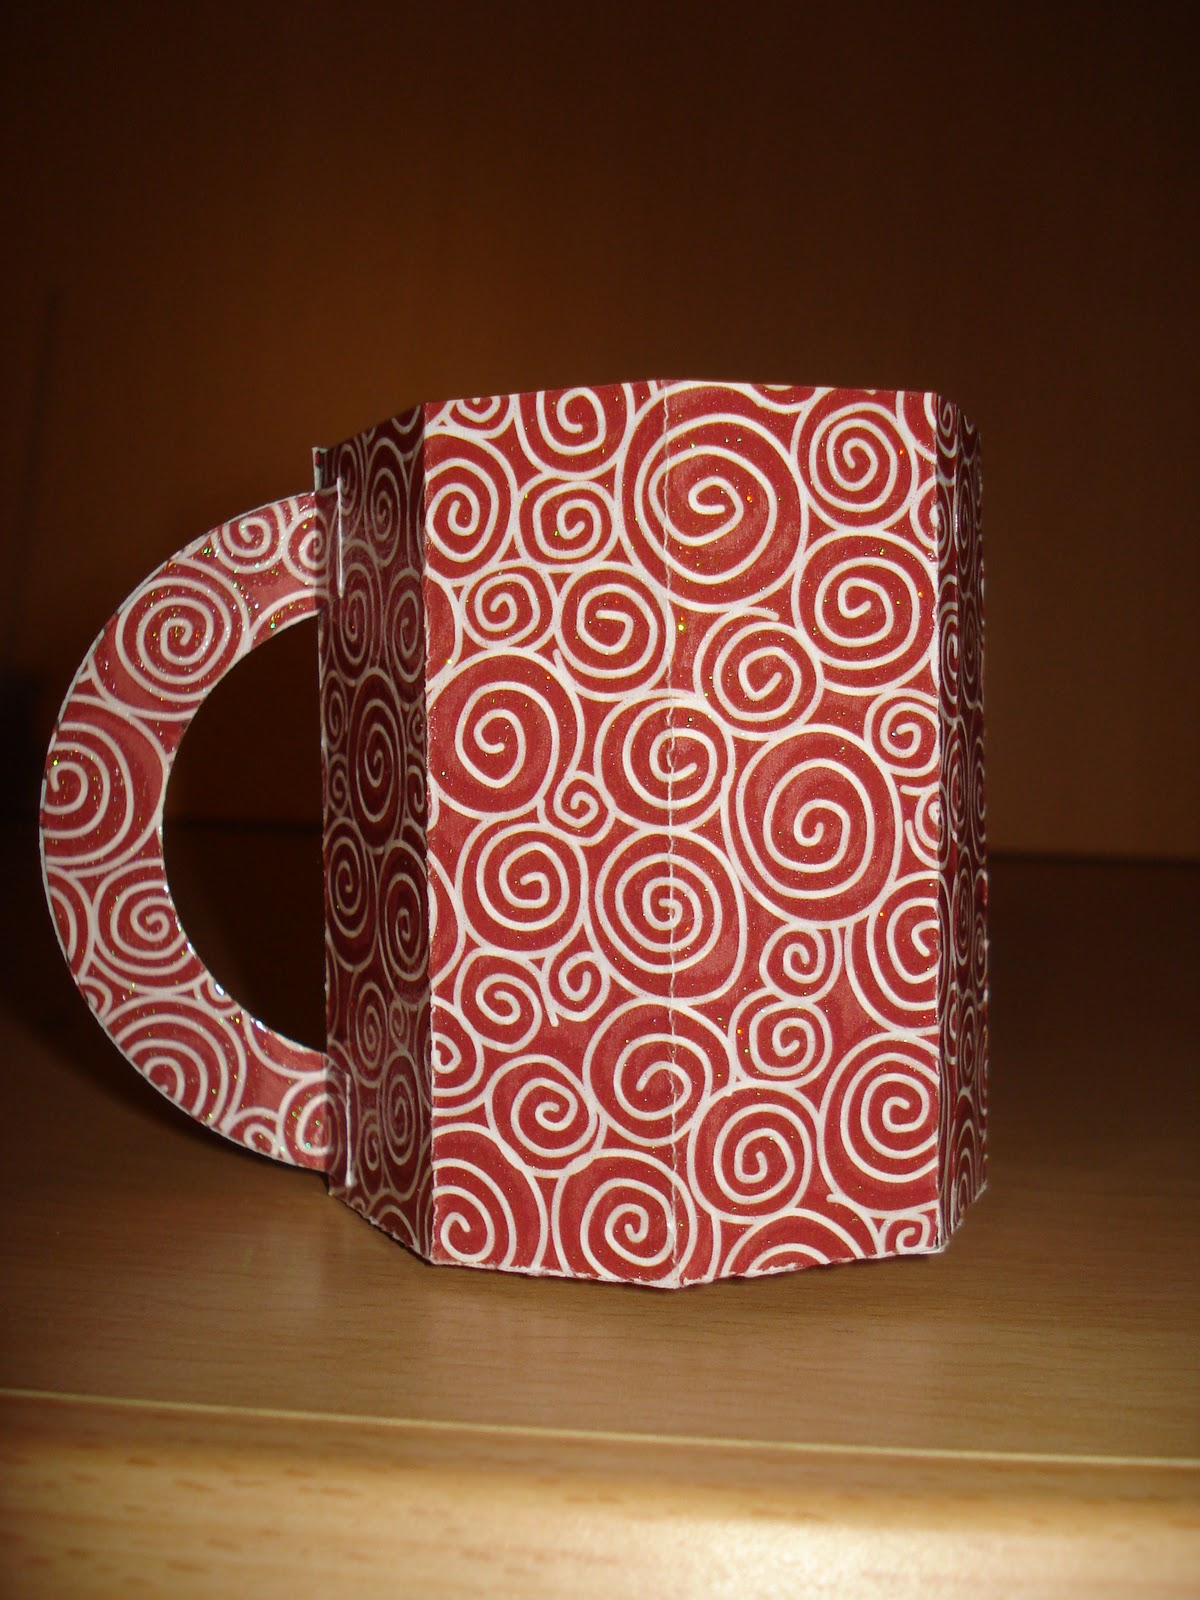 Basteln Mit Tassen conny s kreative welt anleitung kaffeetasse